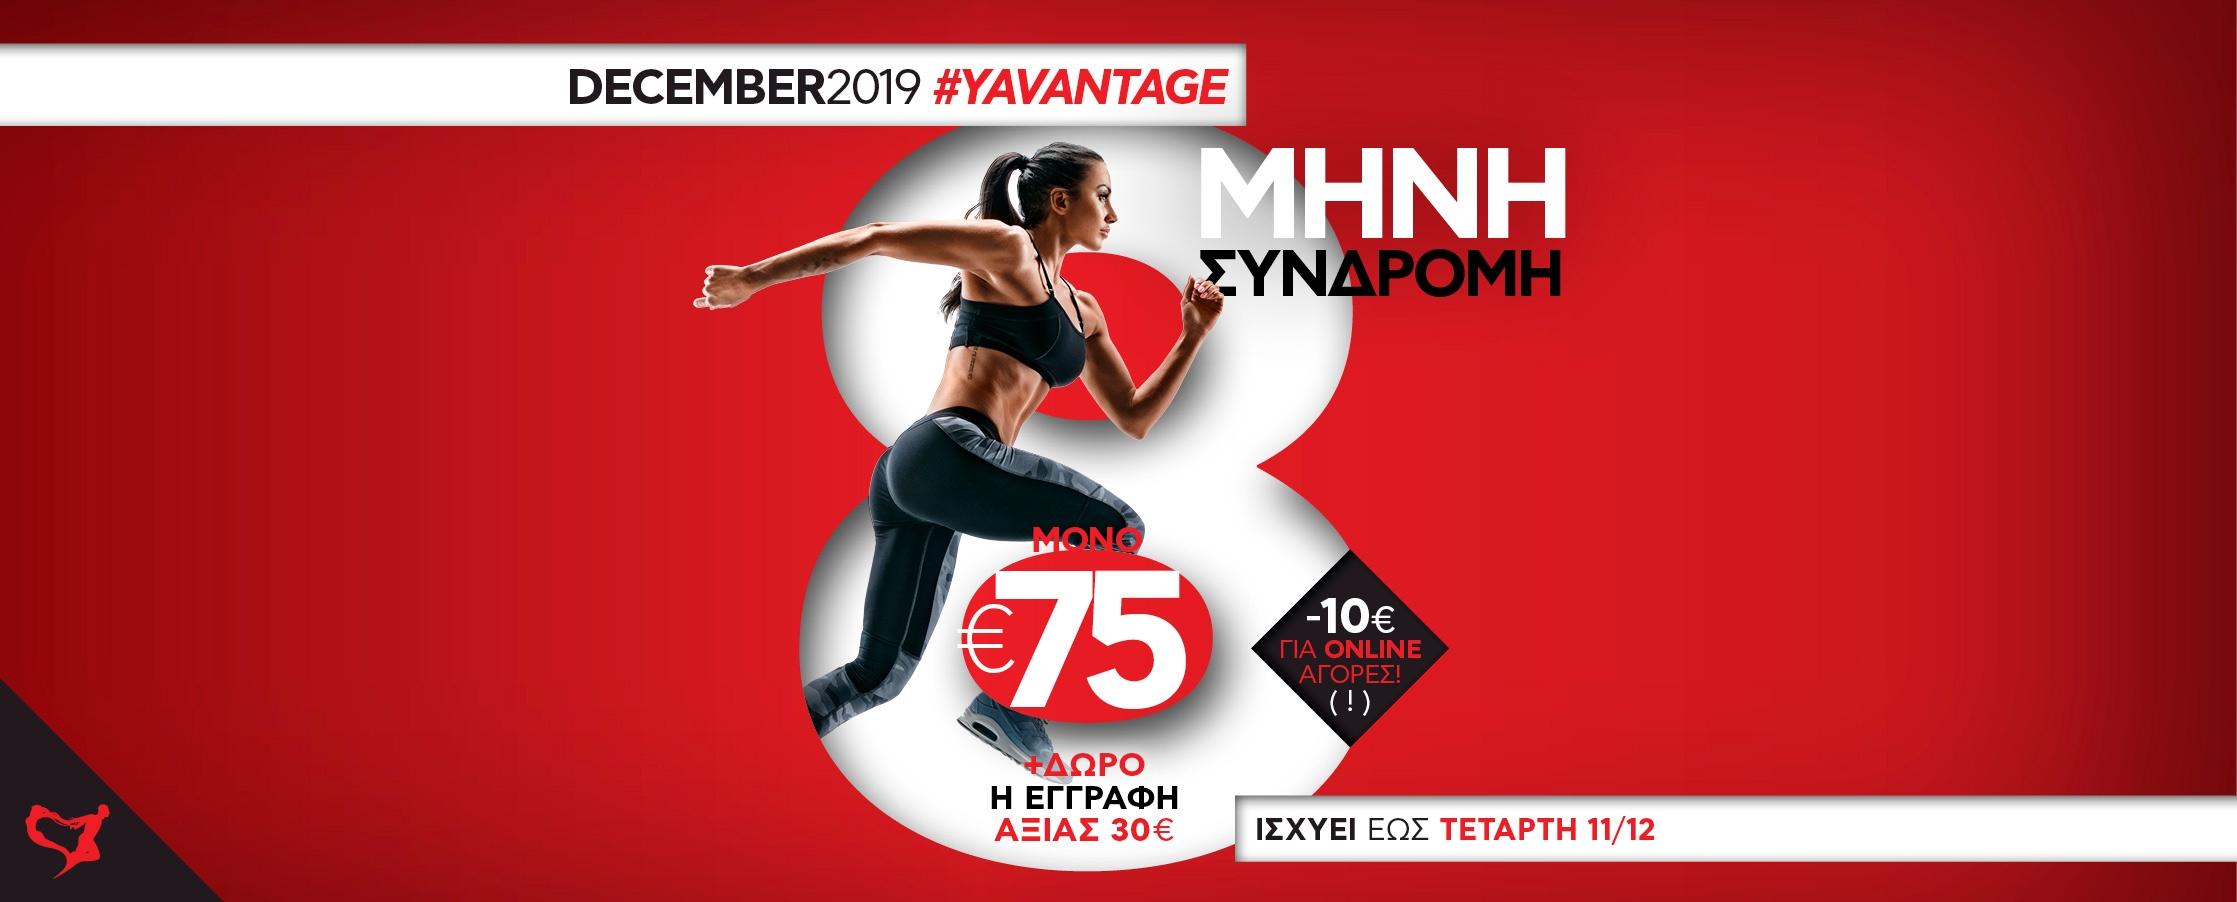 DECEMBER #YAVANTAGE 8ΜΗΝΗ ΜΕ 65€